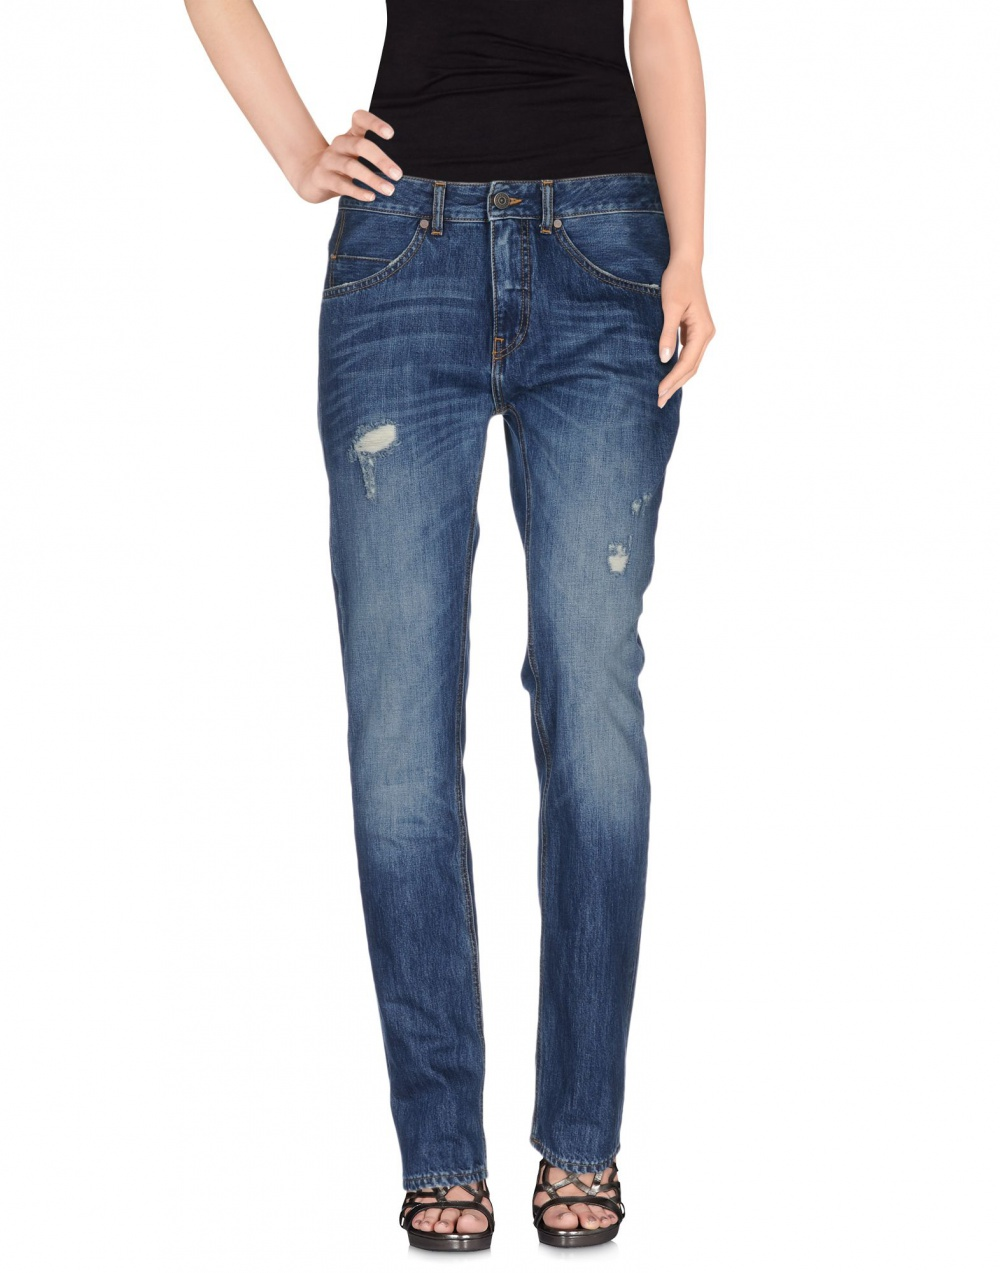 Новые джинсы VINTAGE 55 размер 28